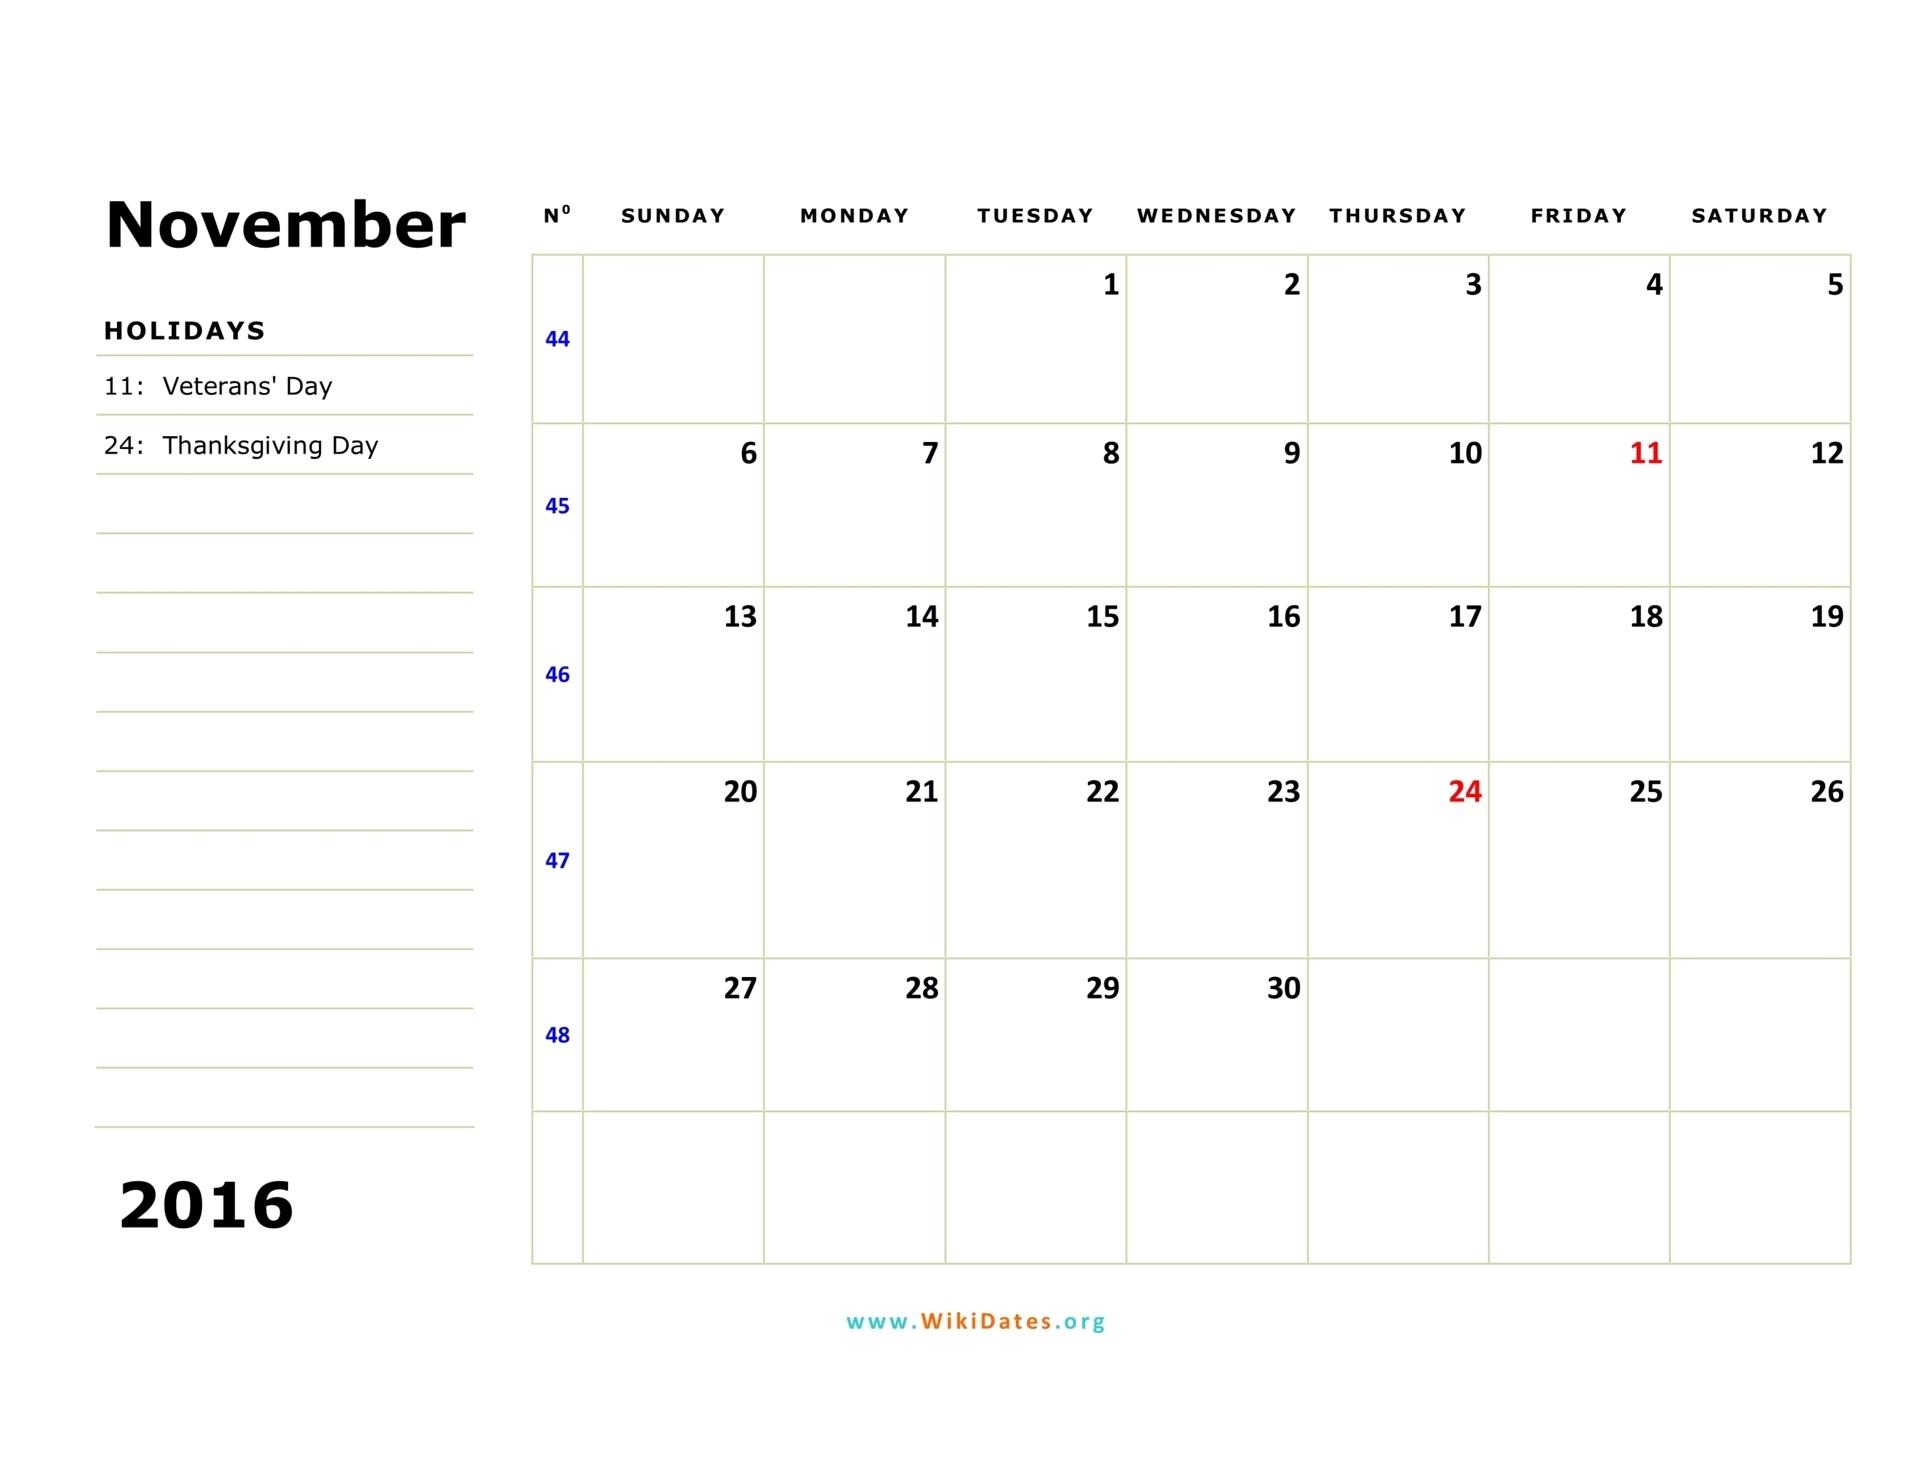 November 2016 Calendar   WikiDates.org